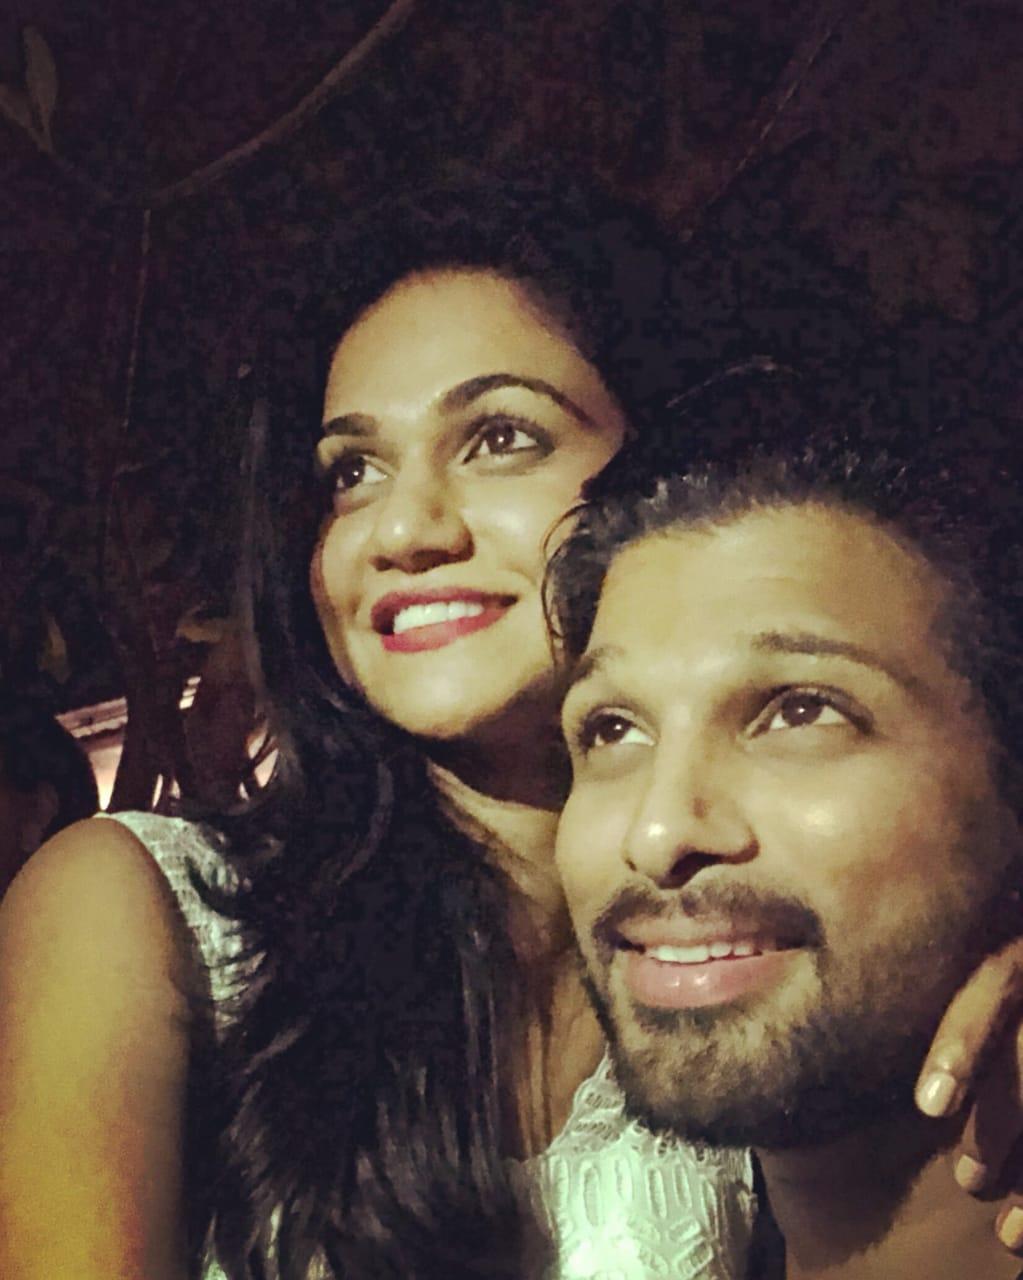 Stylish Star Allu Arjun is King, Sneha Reddy is Queen Of Social Media